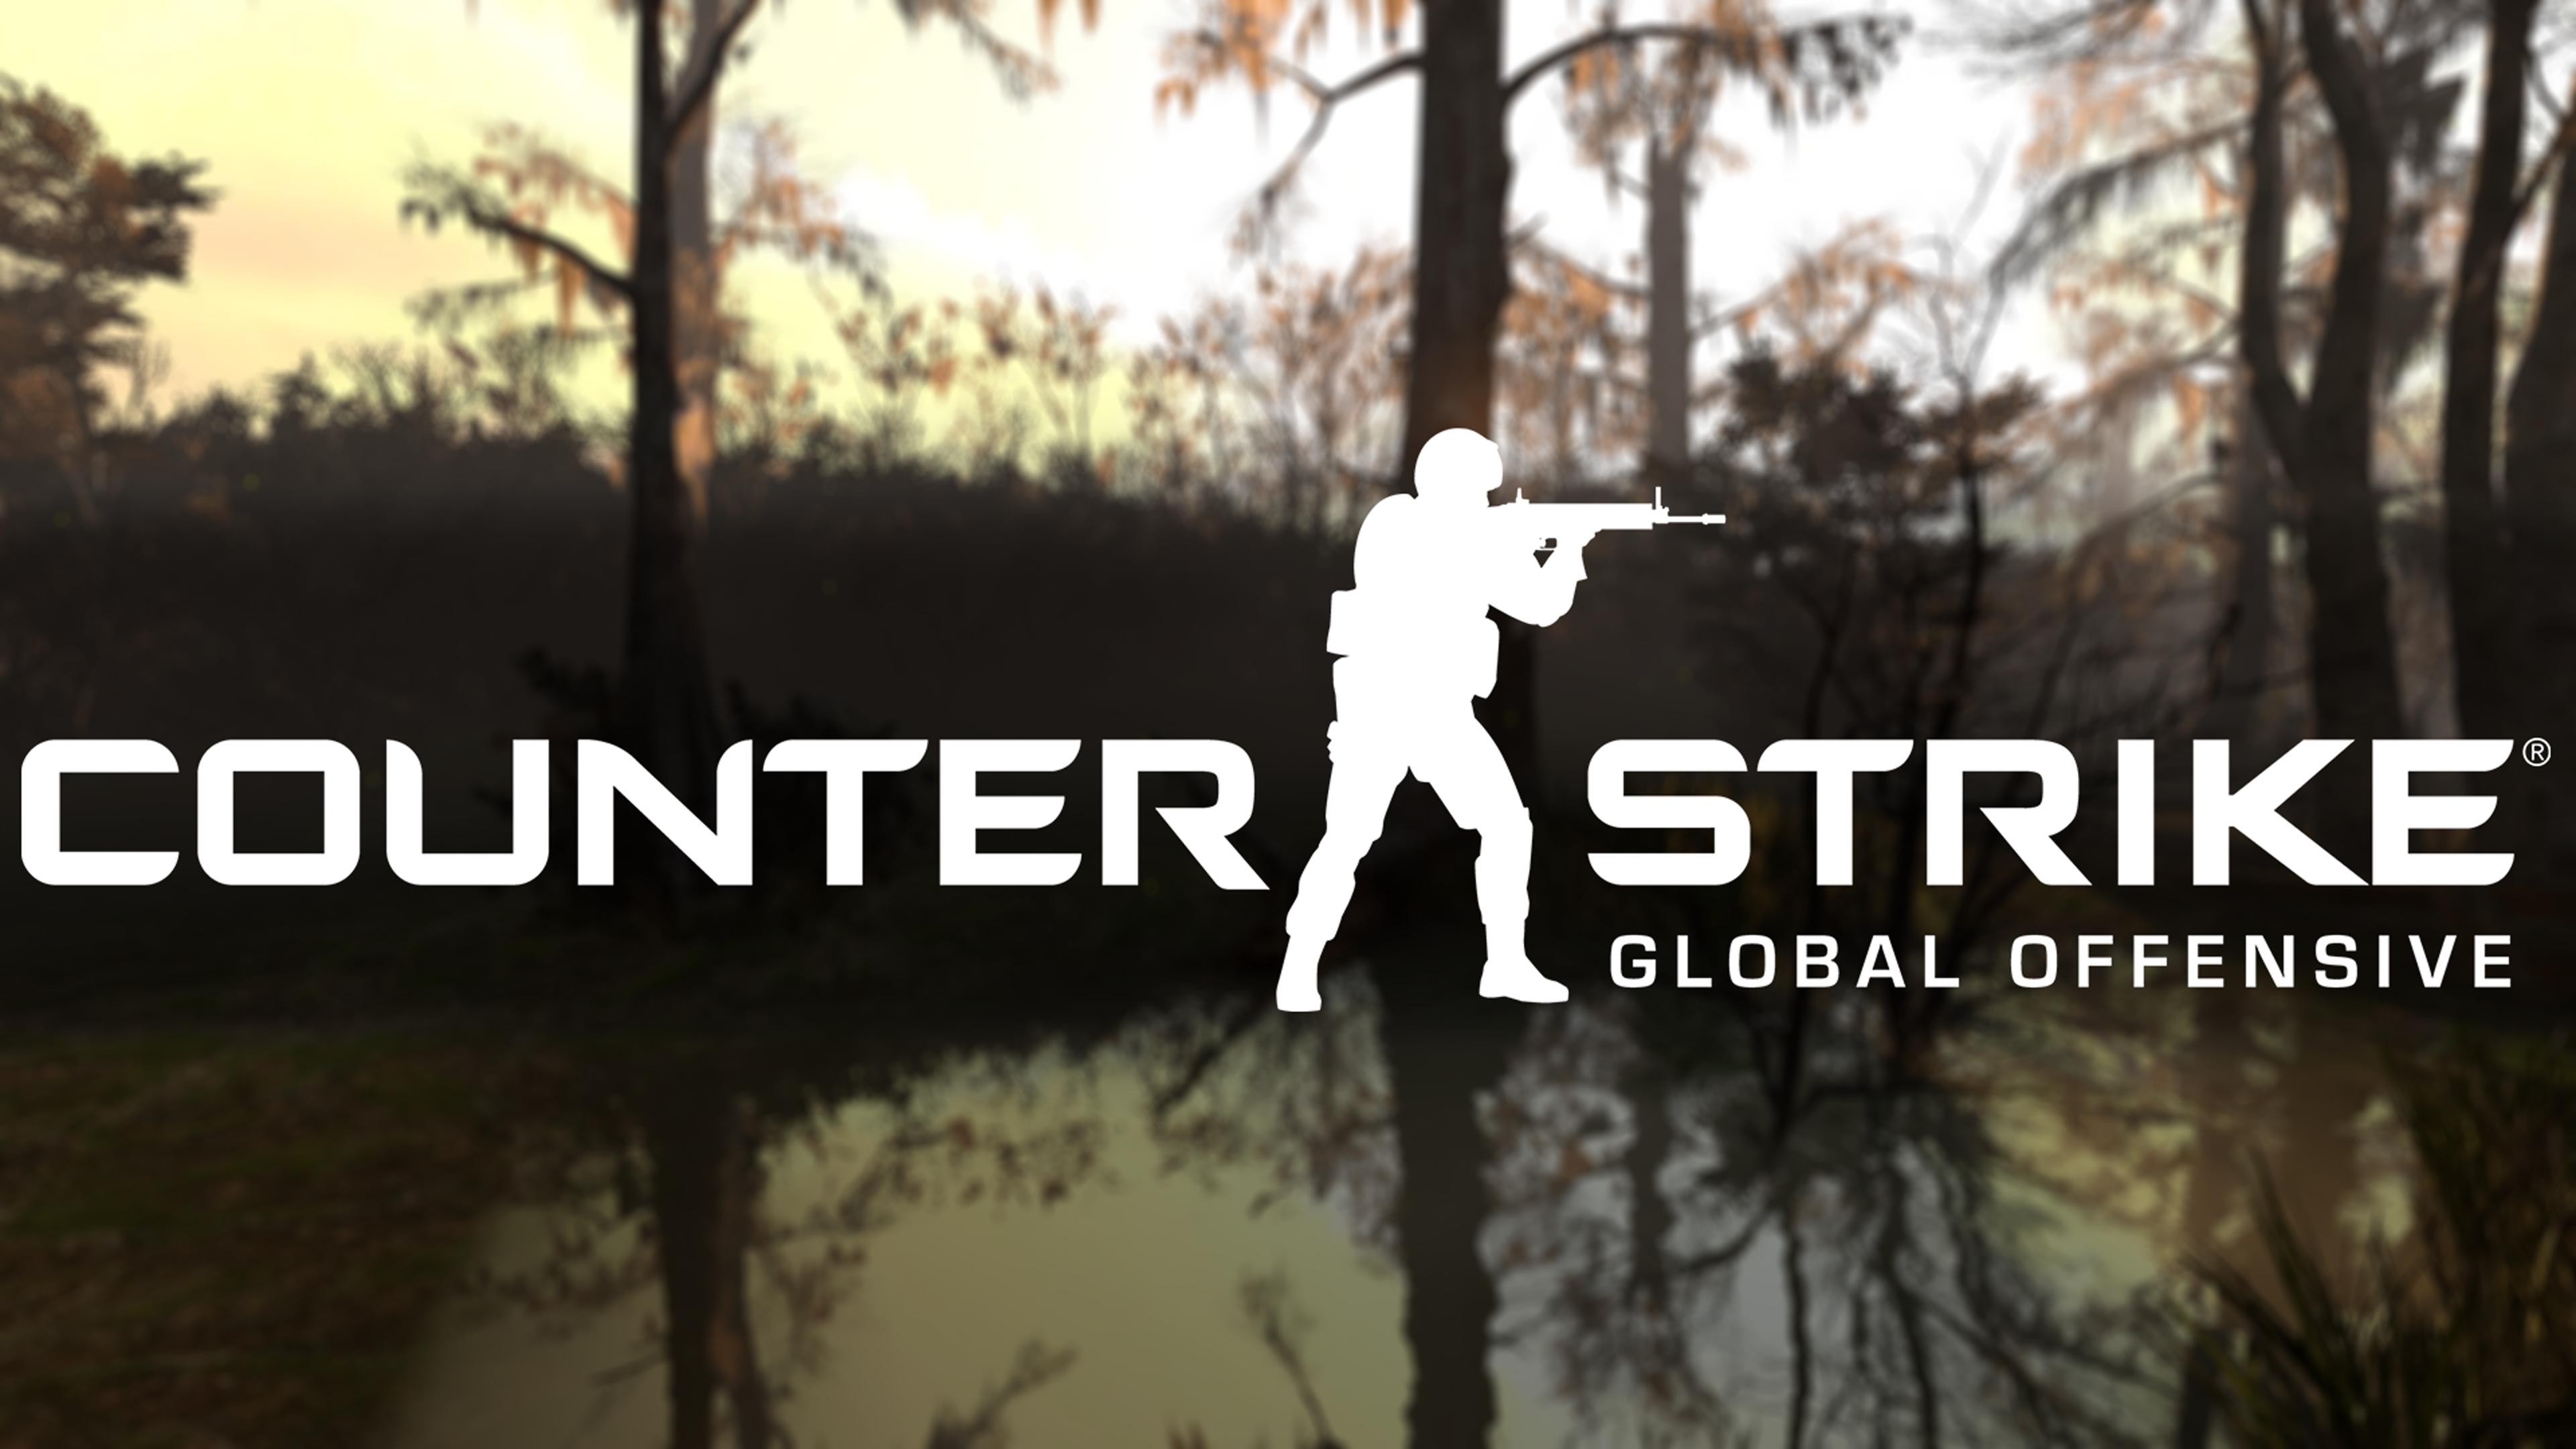 Csgo Swamp Wallpaper Games Globaloffensive Csgo Counterstrike Hltv Cs Steam Valve Djswat Cs16 Swamp Offensive Wallpaper